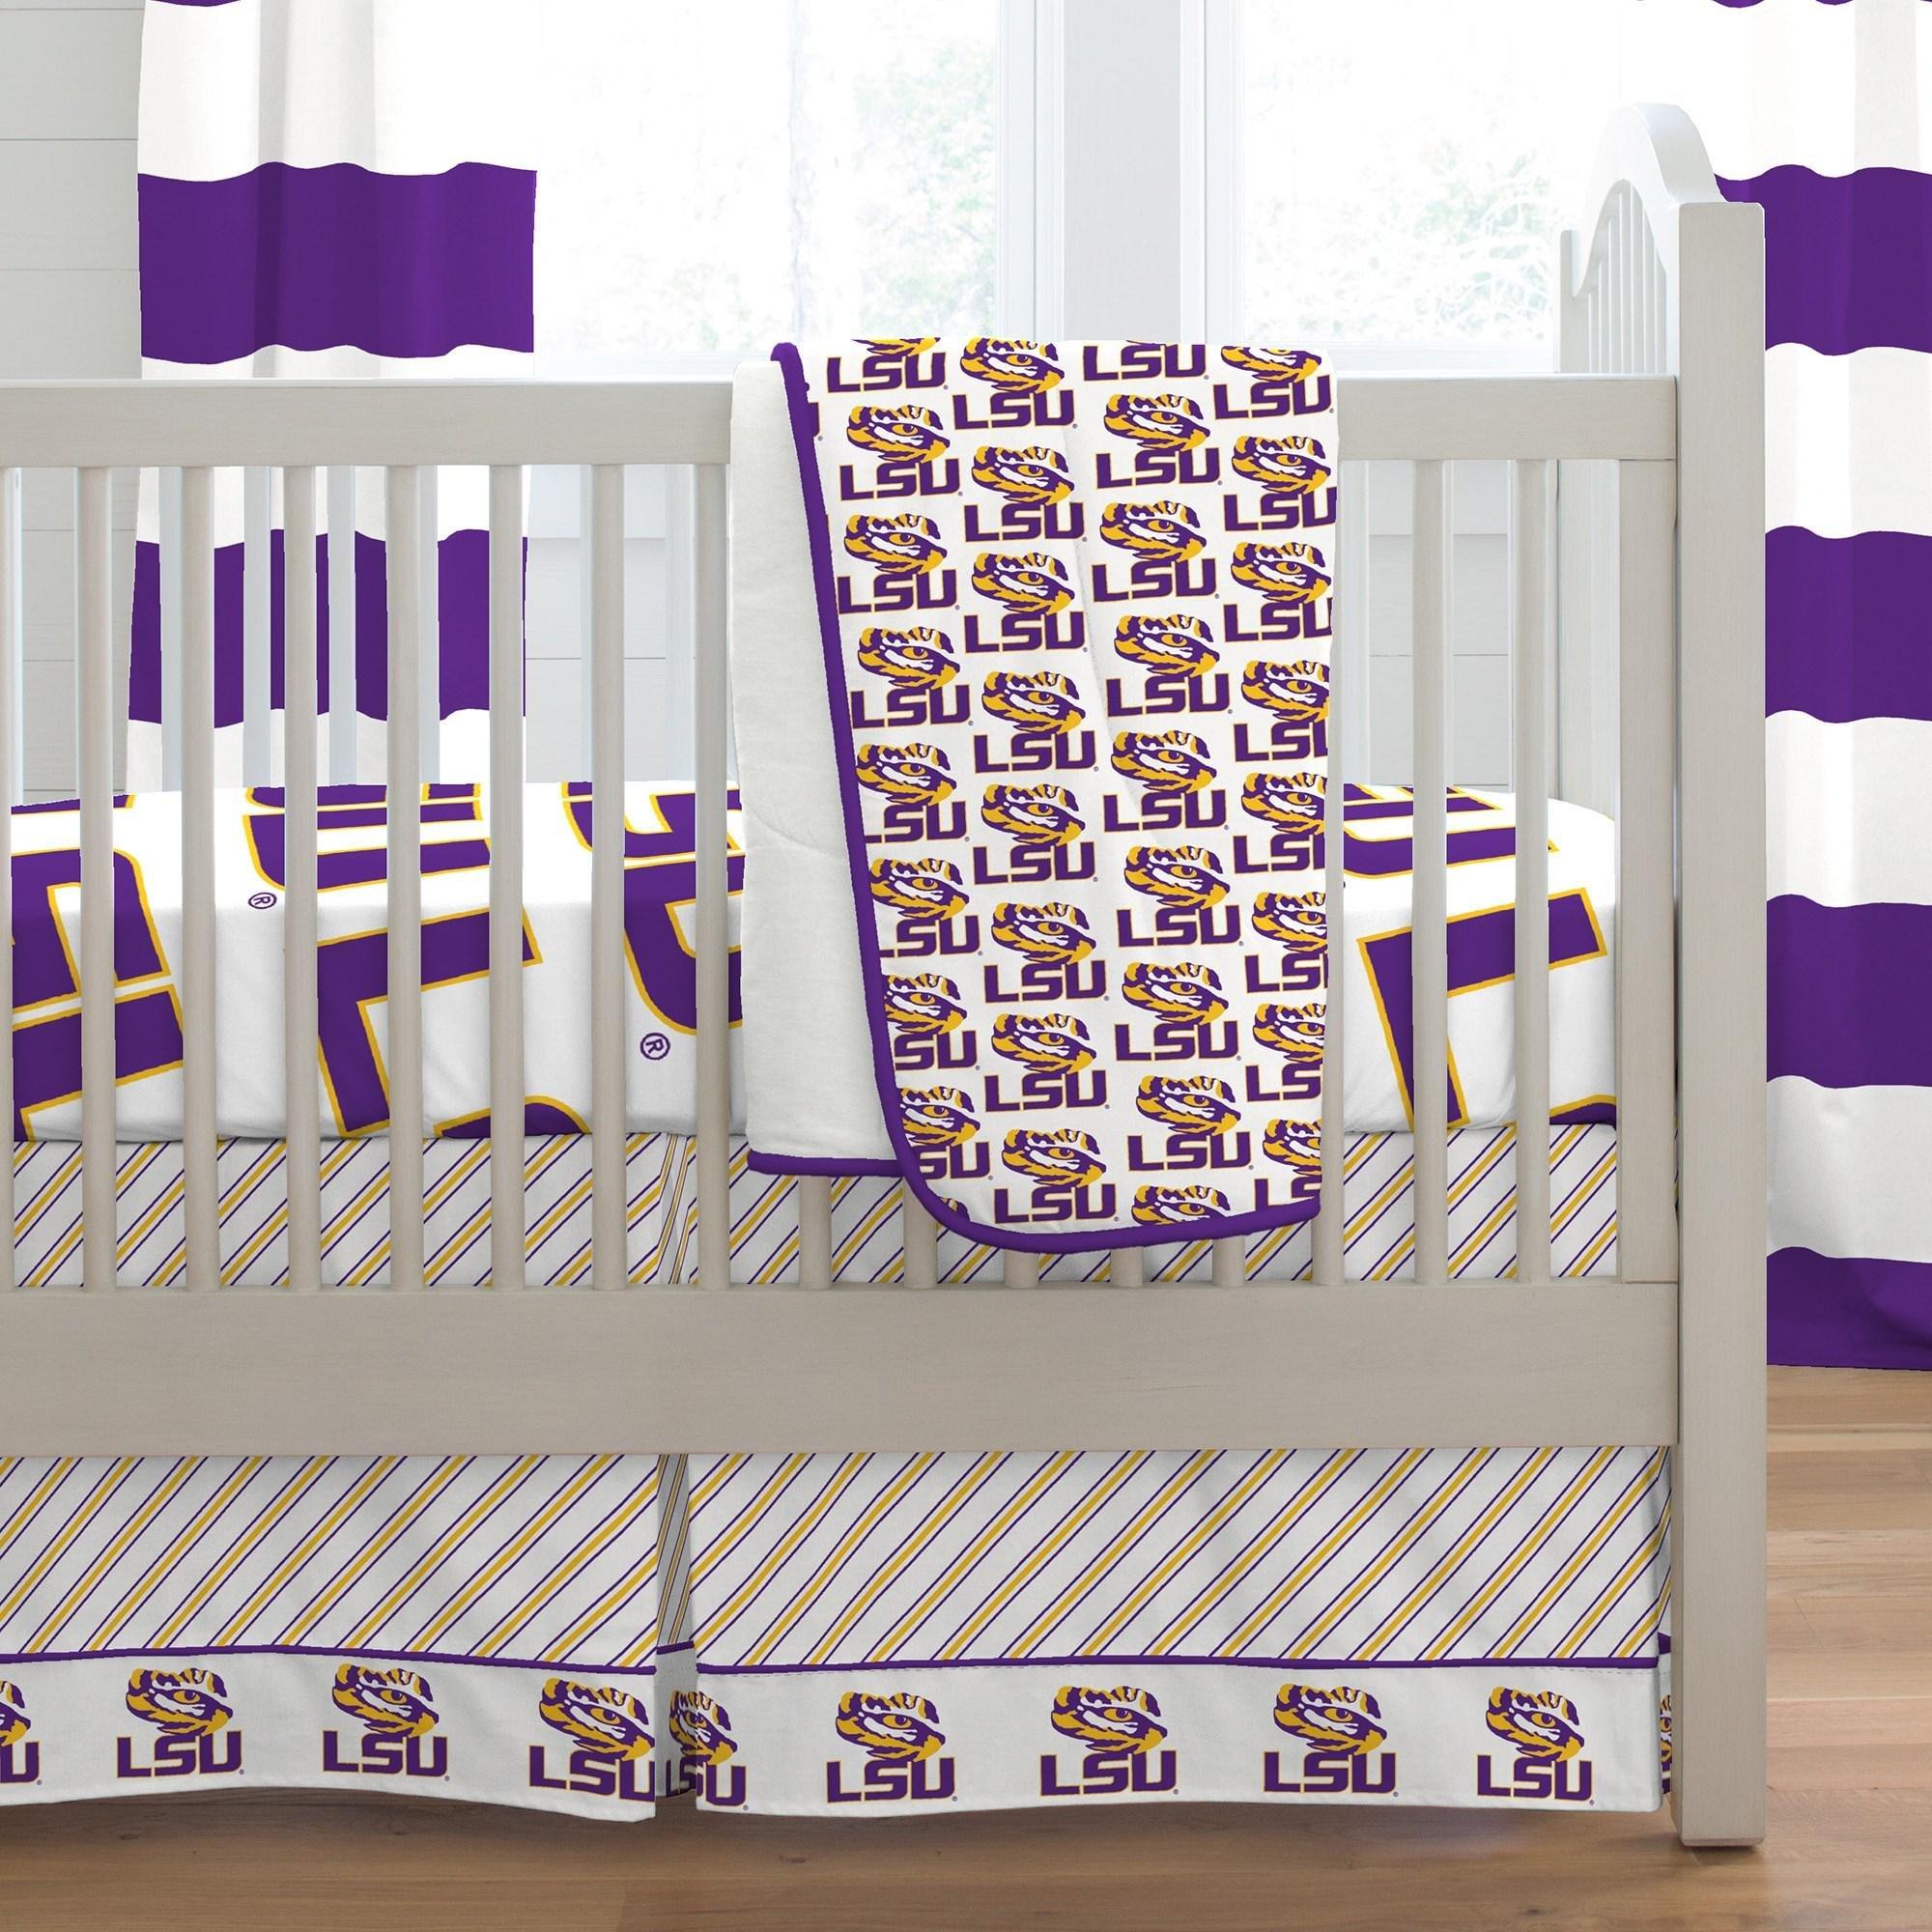 Carousel Designs LSU Crib Comforter